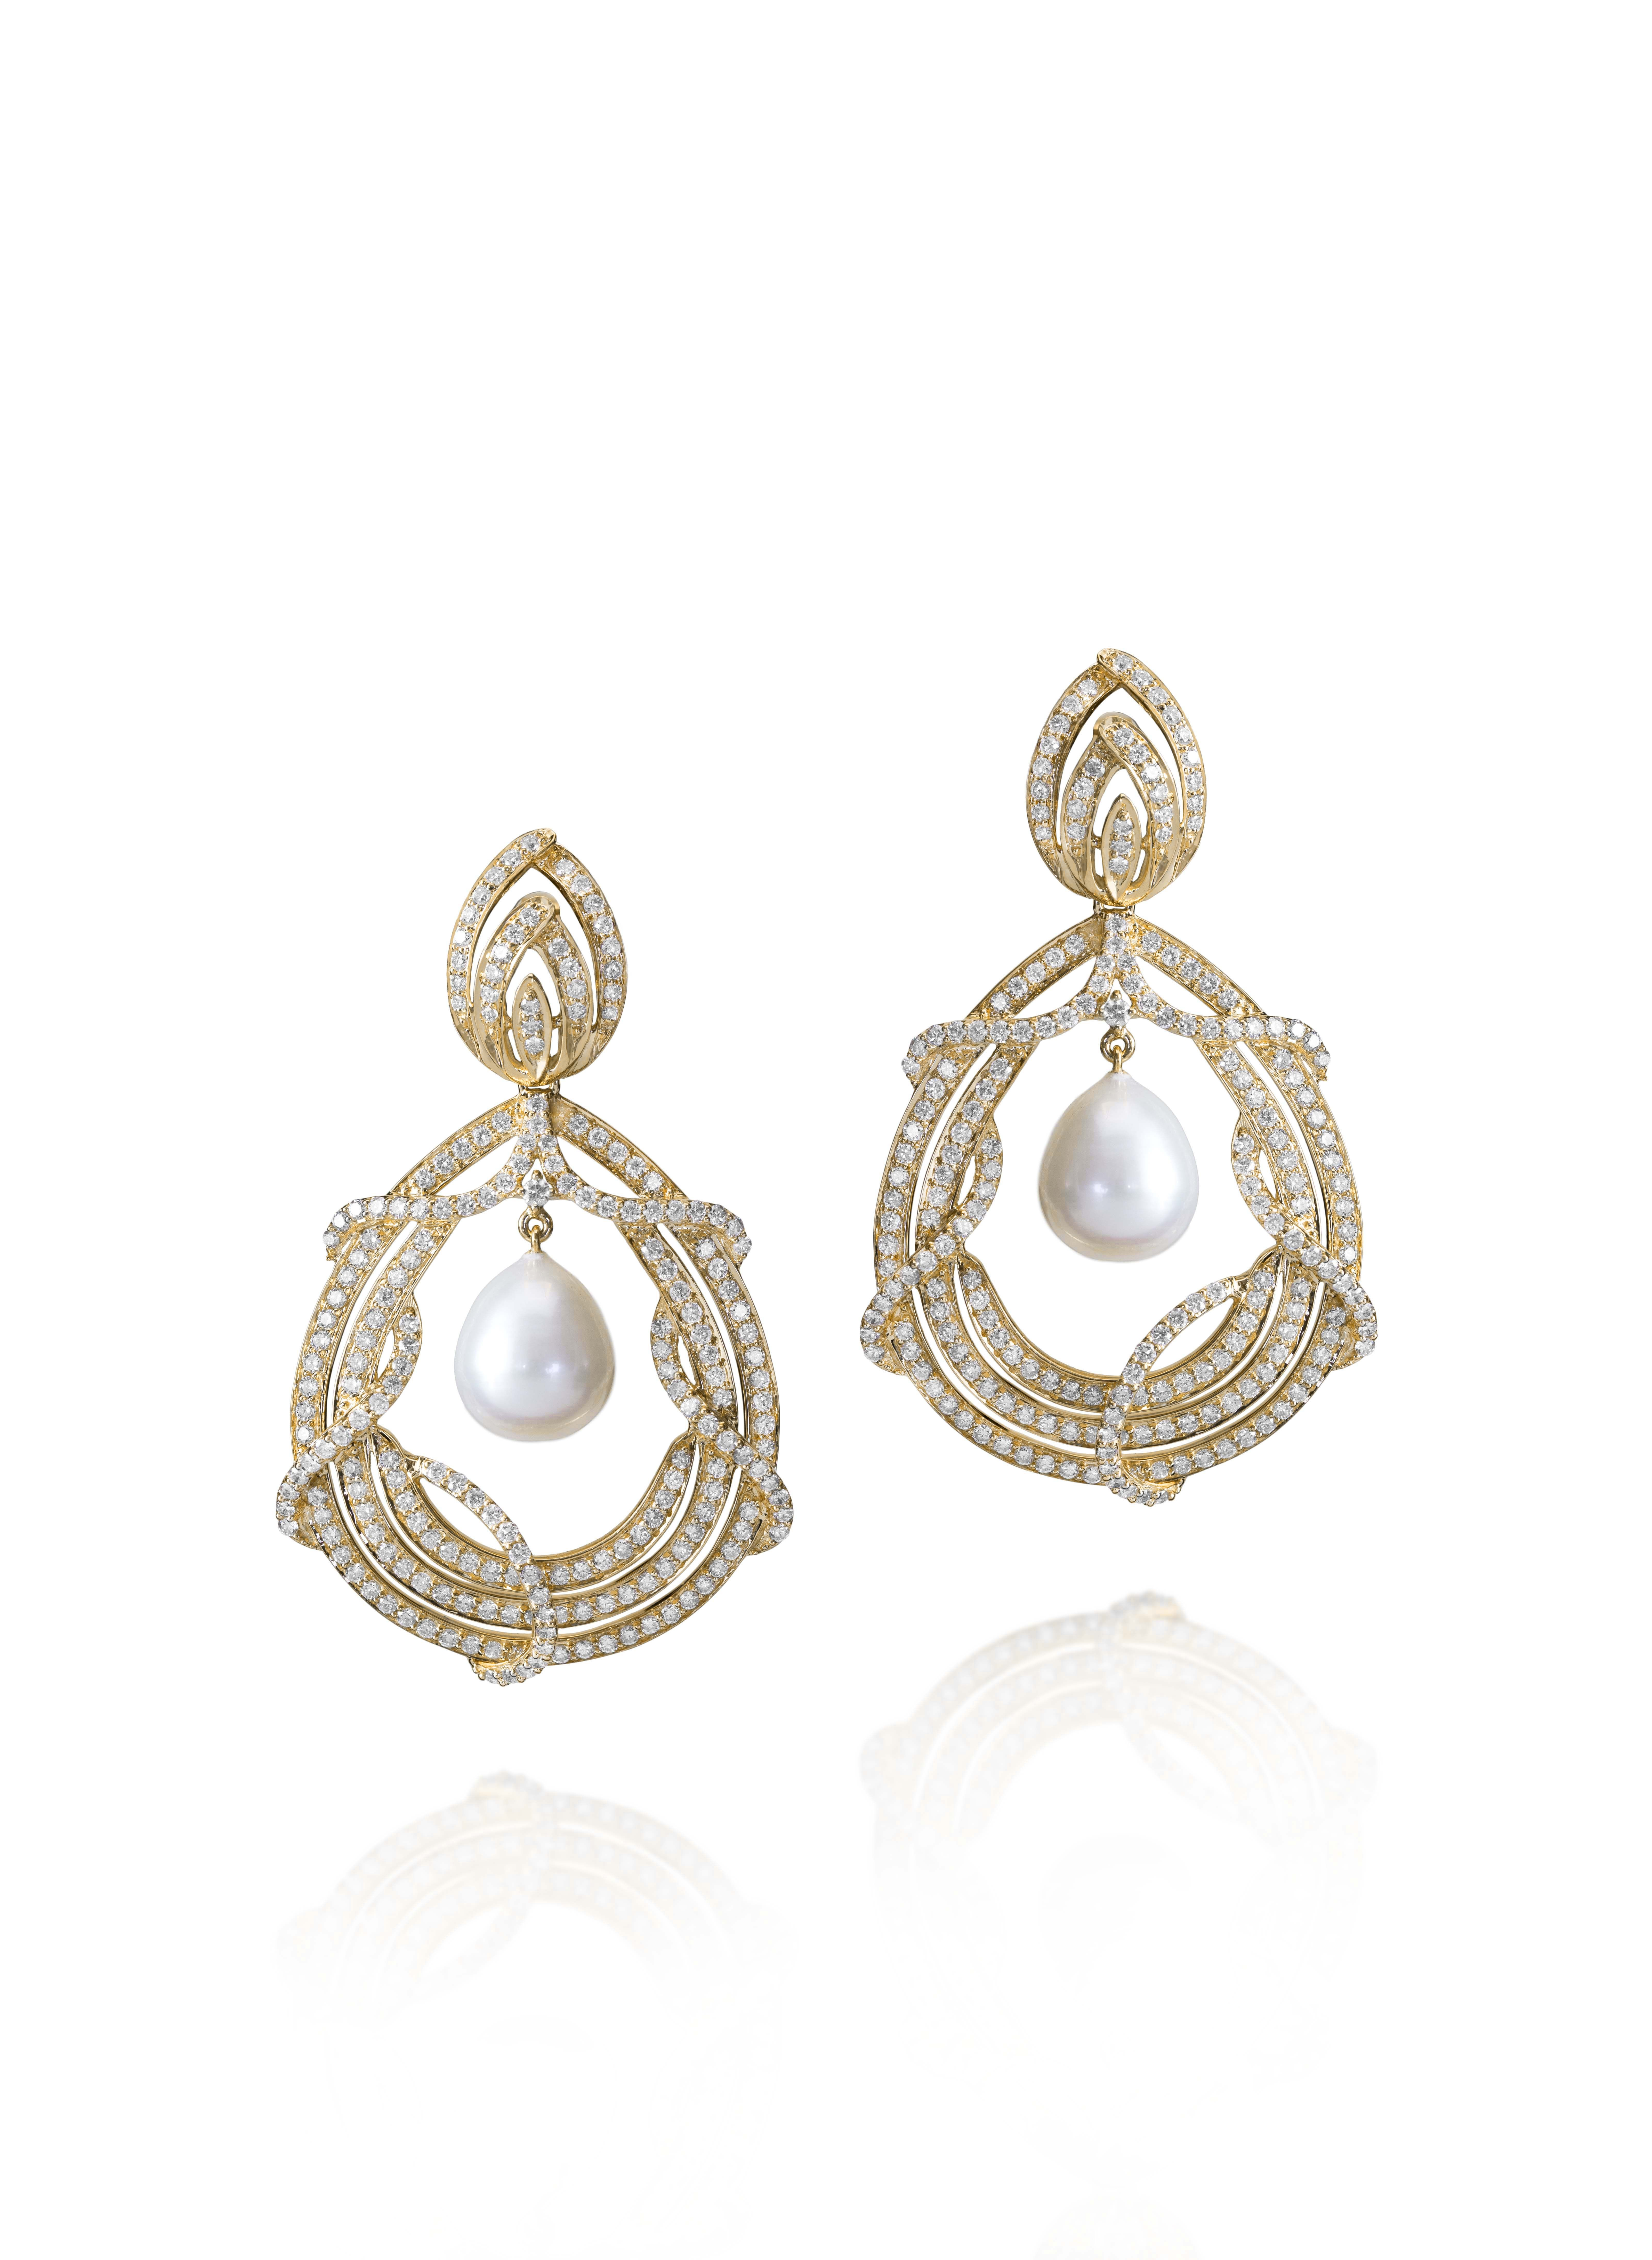 Designer Farah Khan Ali /Diamond chandelier earrings with pearl ...